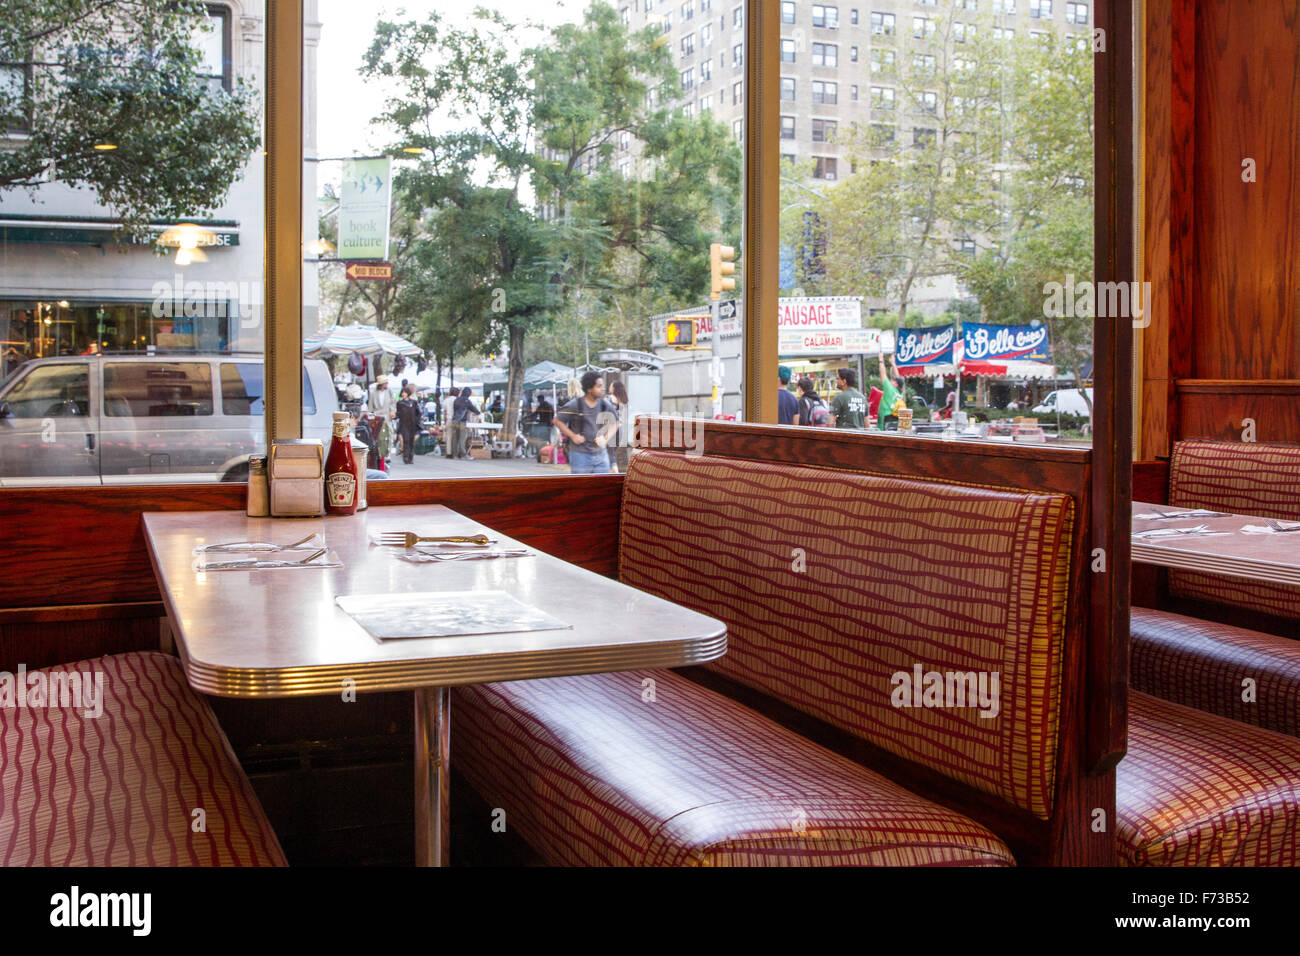 New York City Diner Booth Stock Photo Alamy